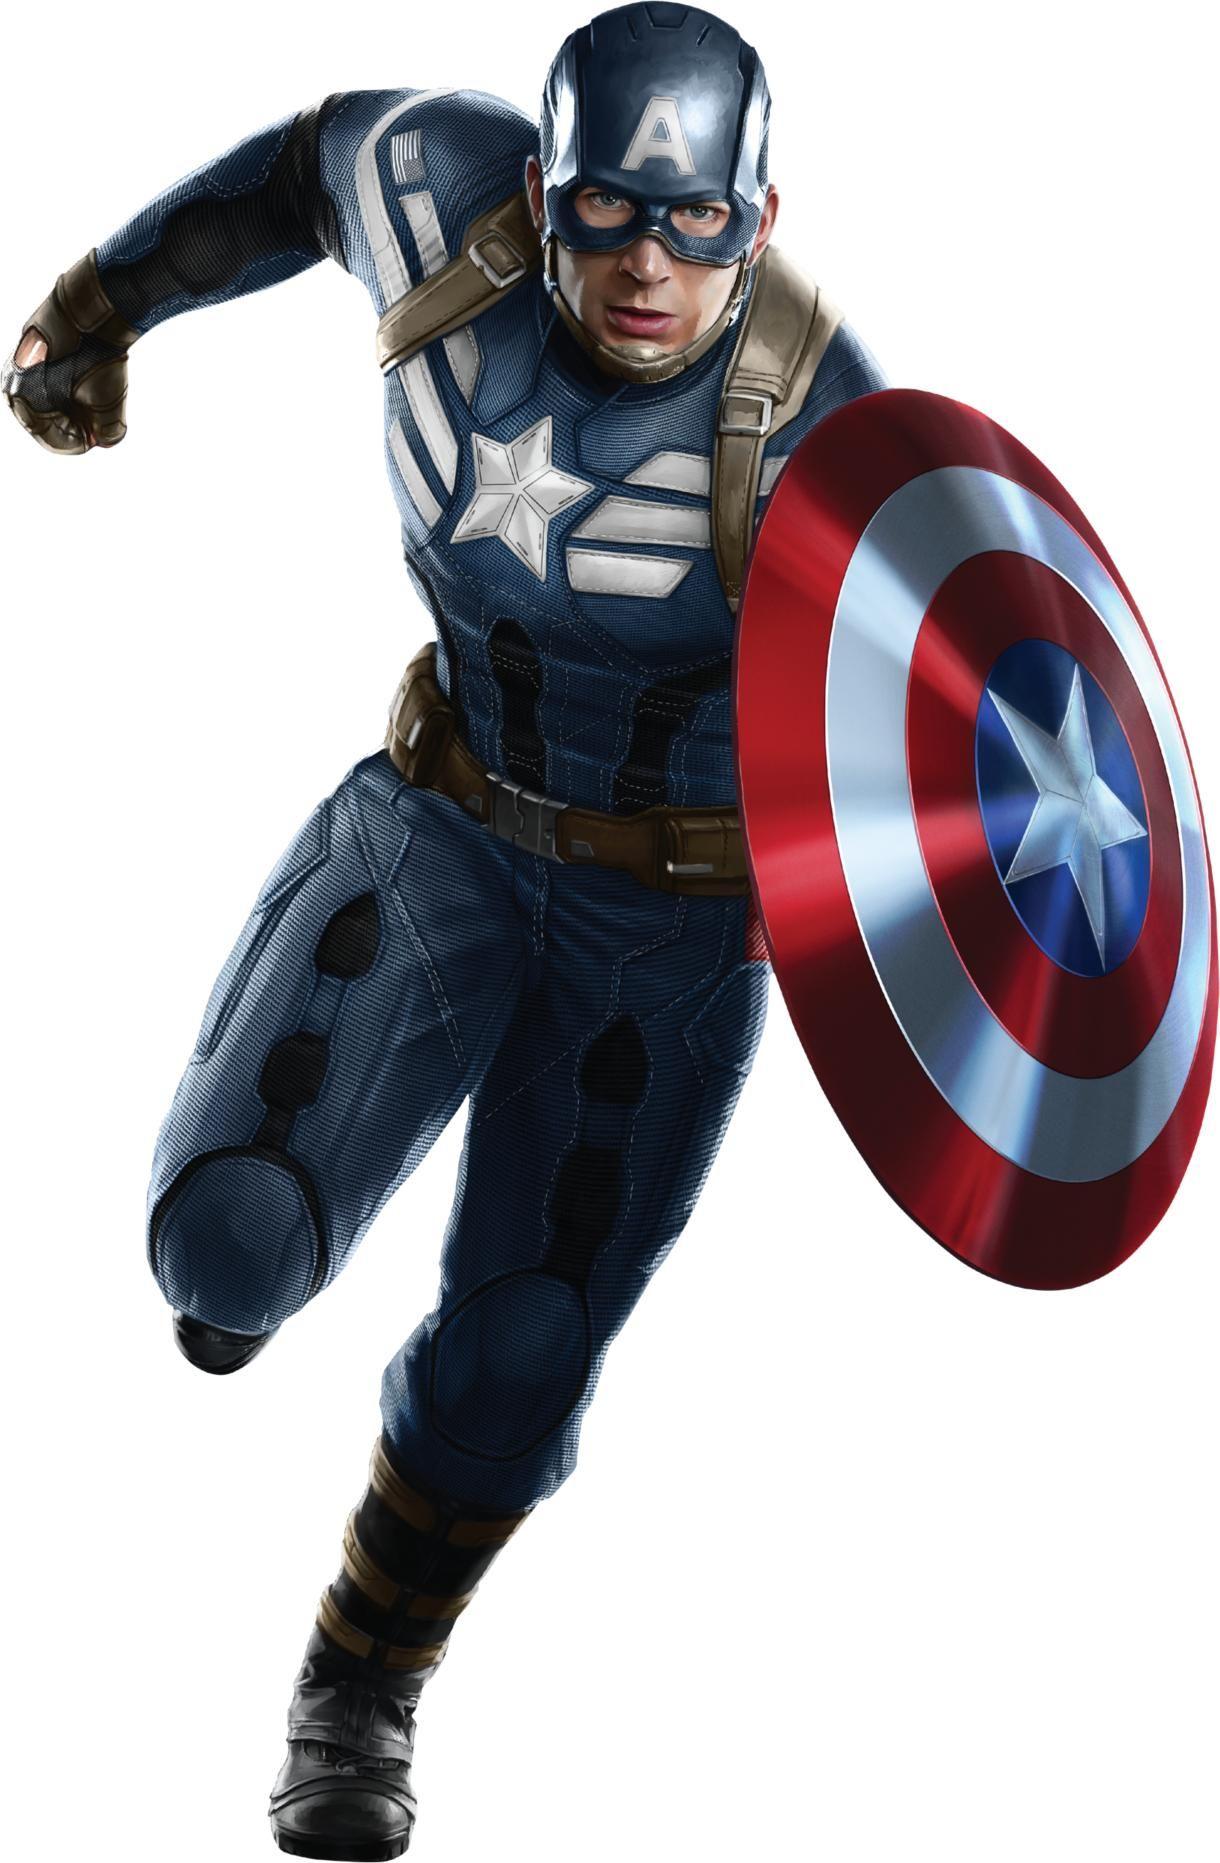 Pin Na Doske Captain America And The Falcon